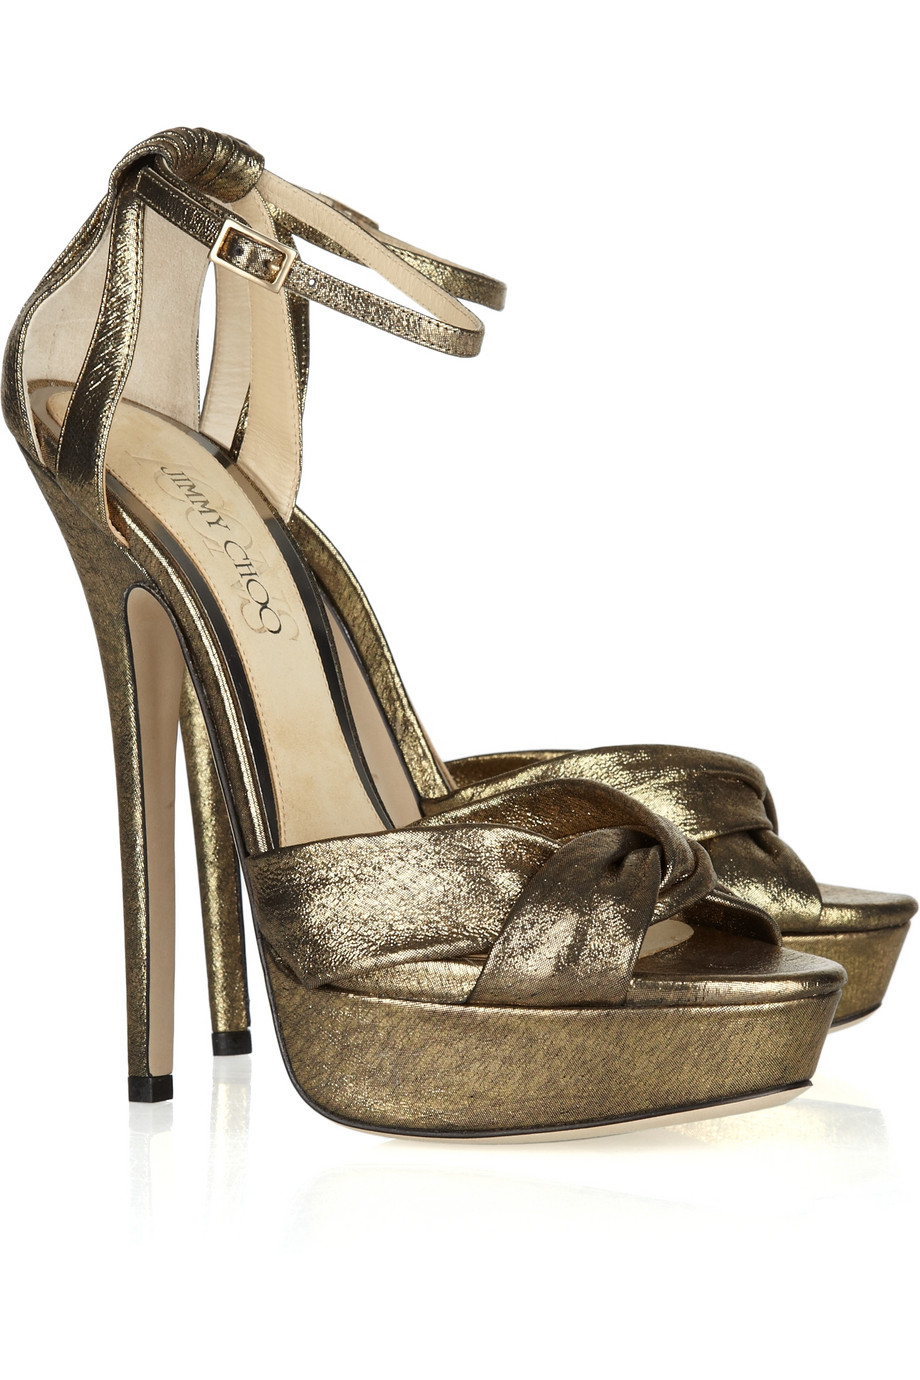 6a1b196a583 Jimmy Choo  Kaya  Sandals in Metallic - Lyst